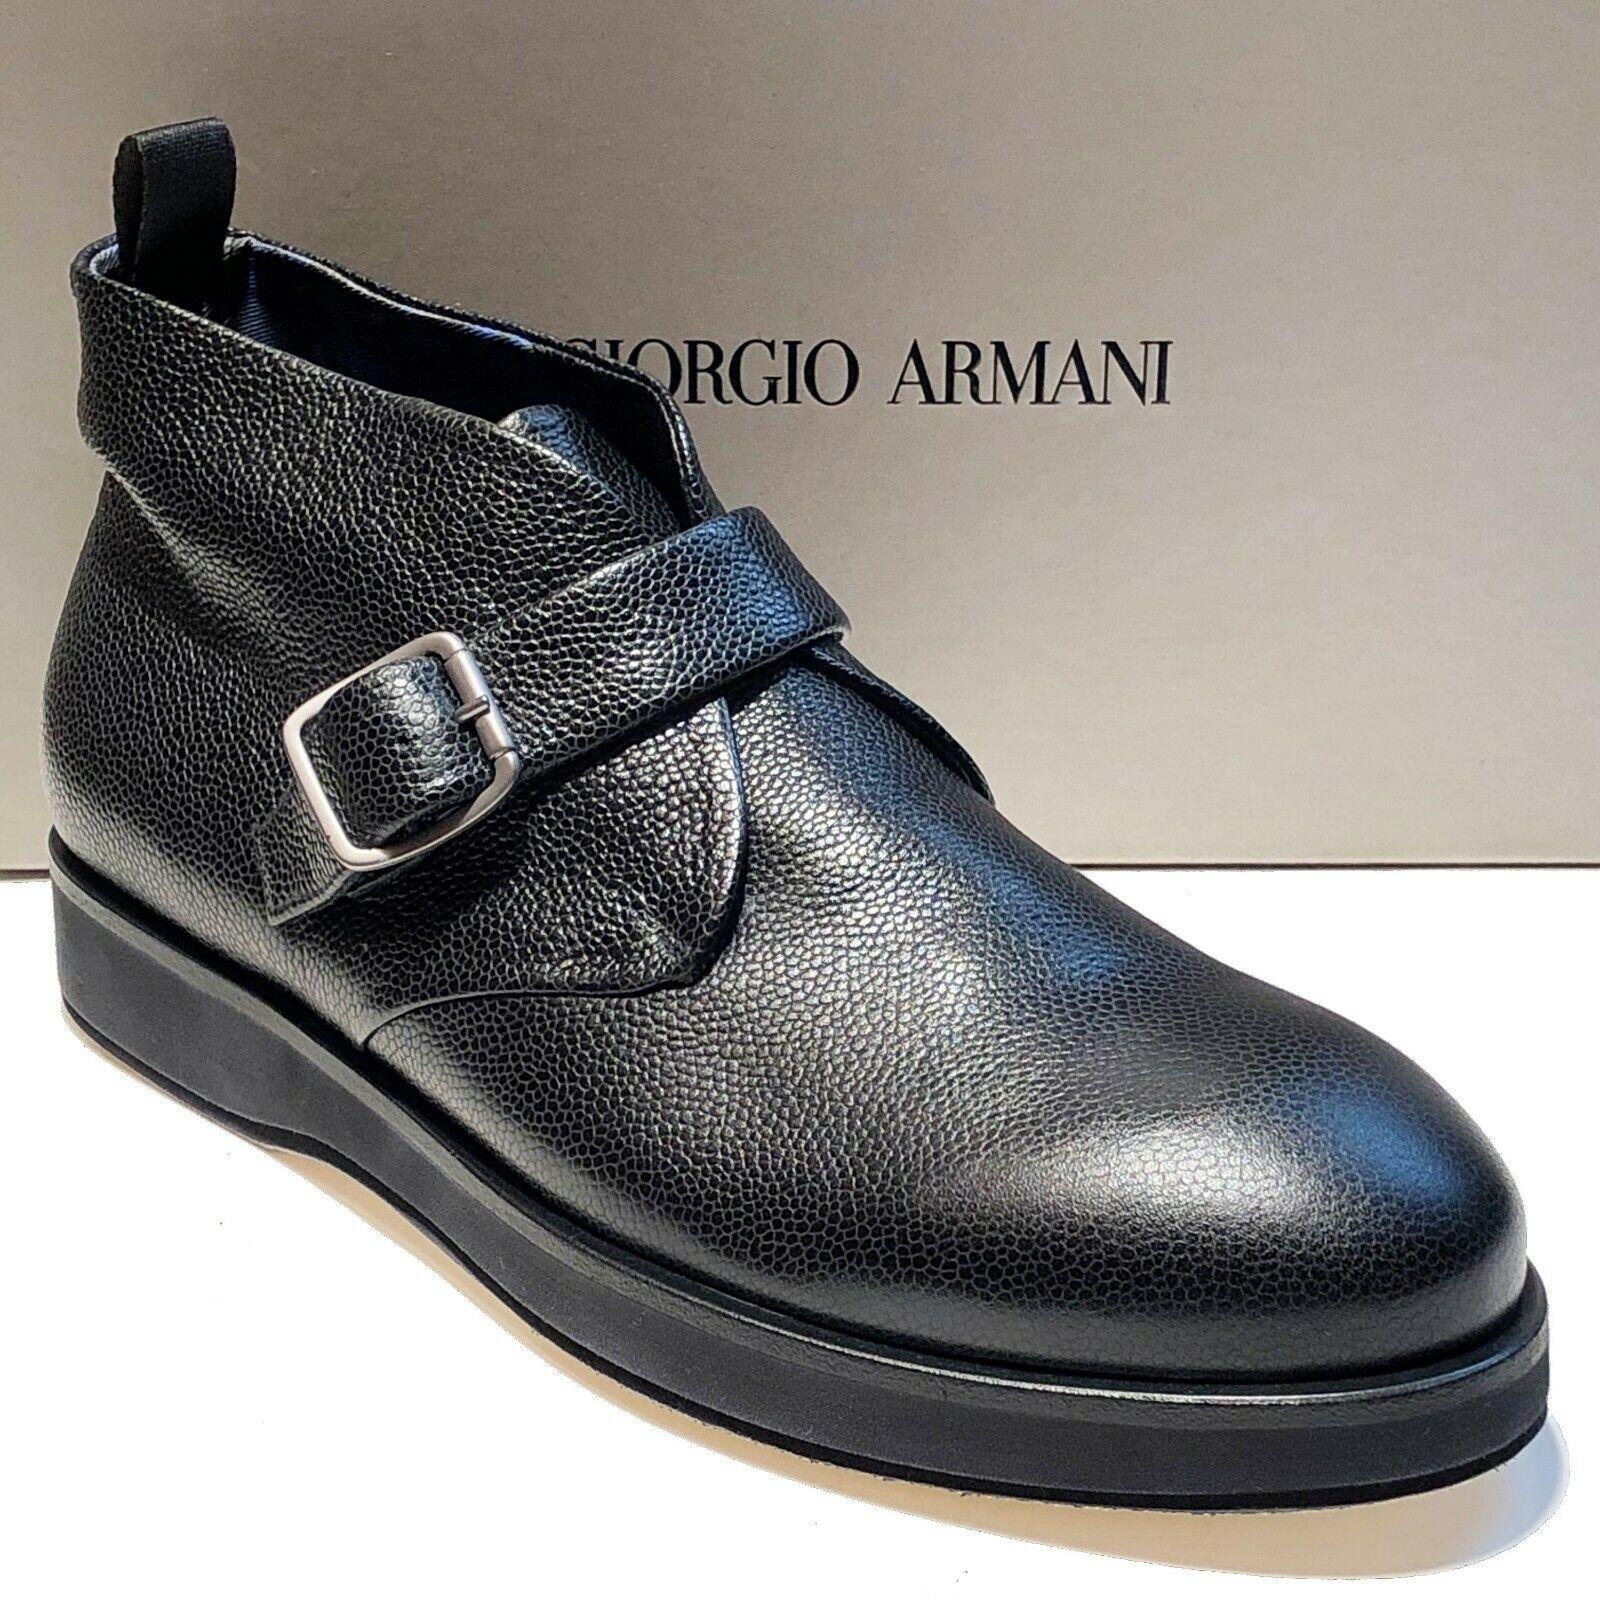 Giorgio Nuevo Negro Armani De Hombre Para Tobillo Al